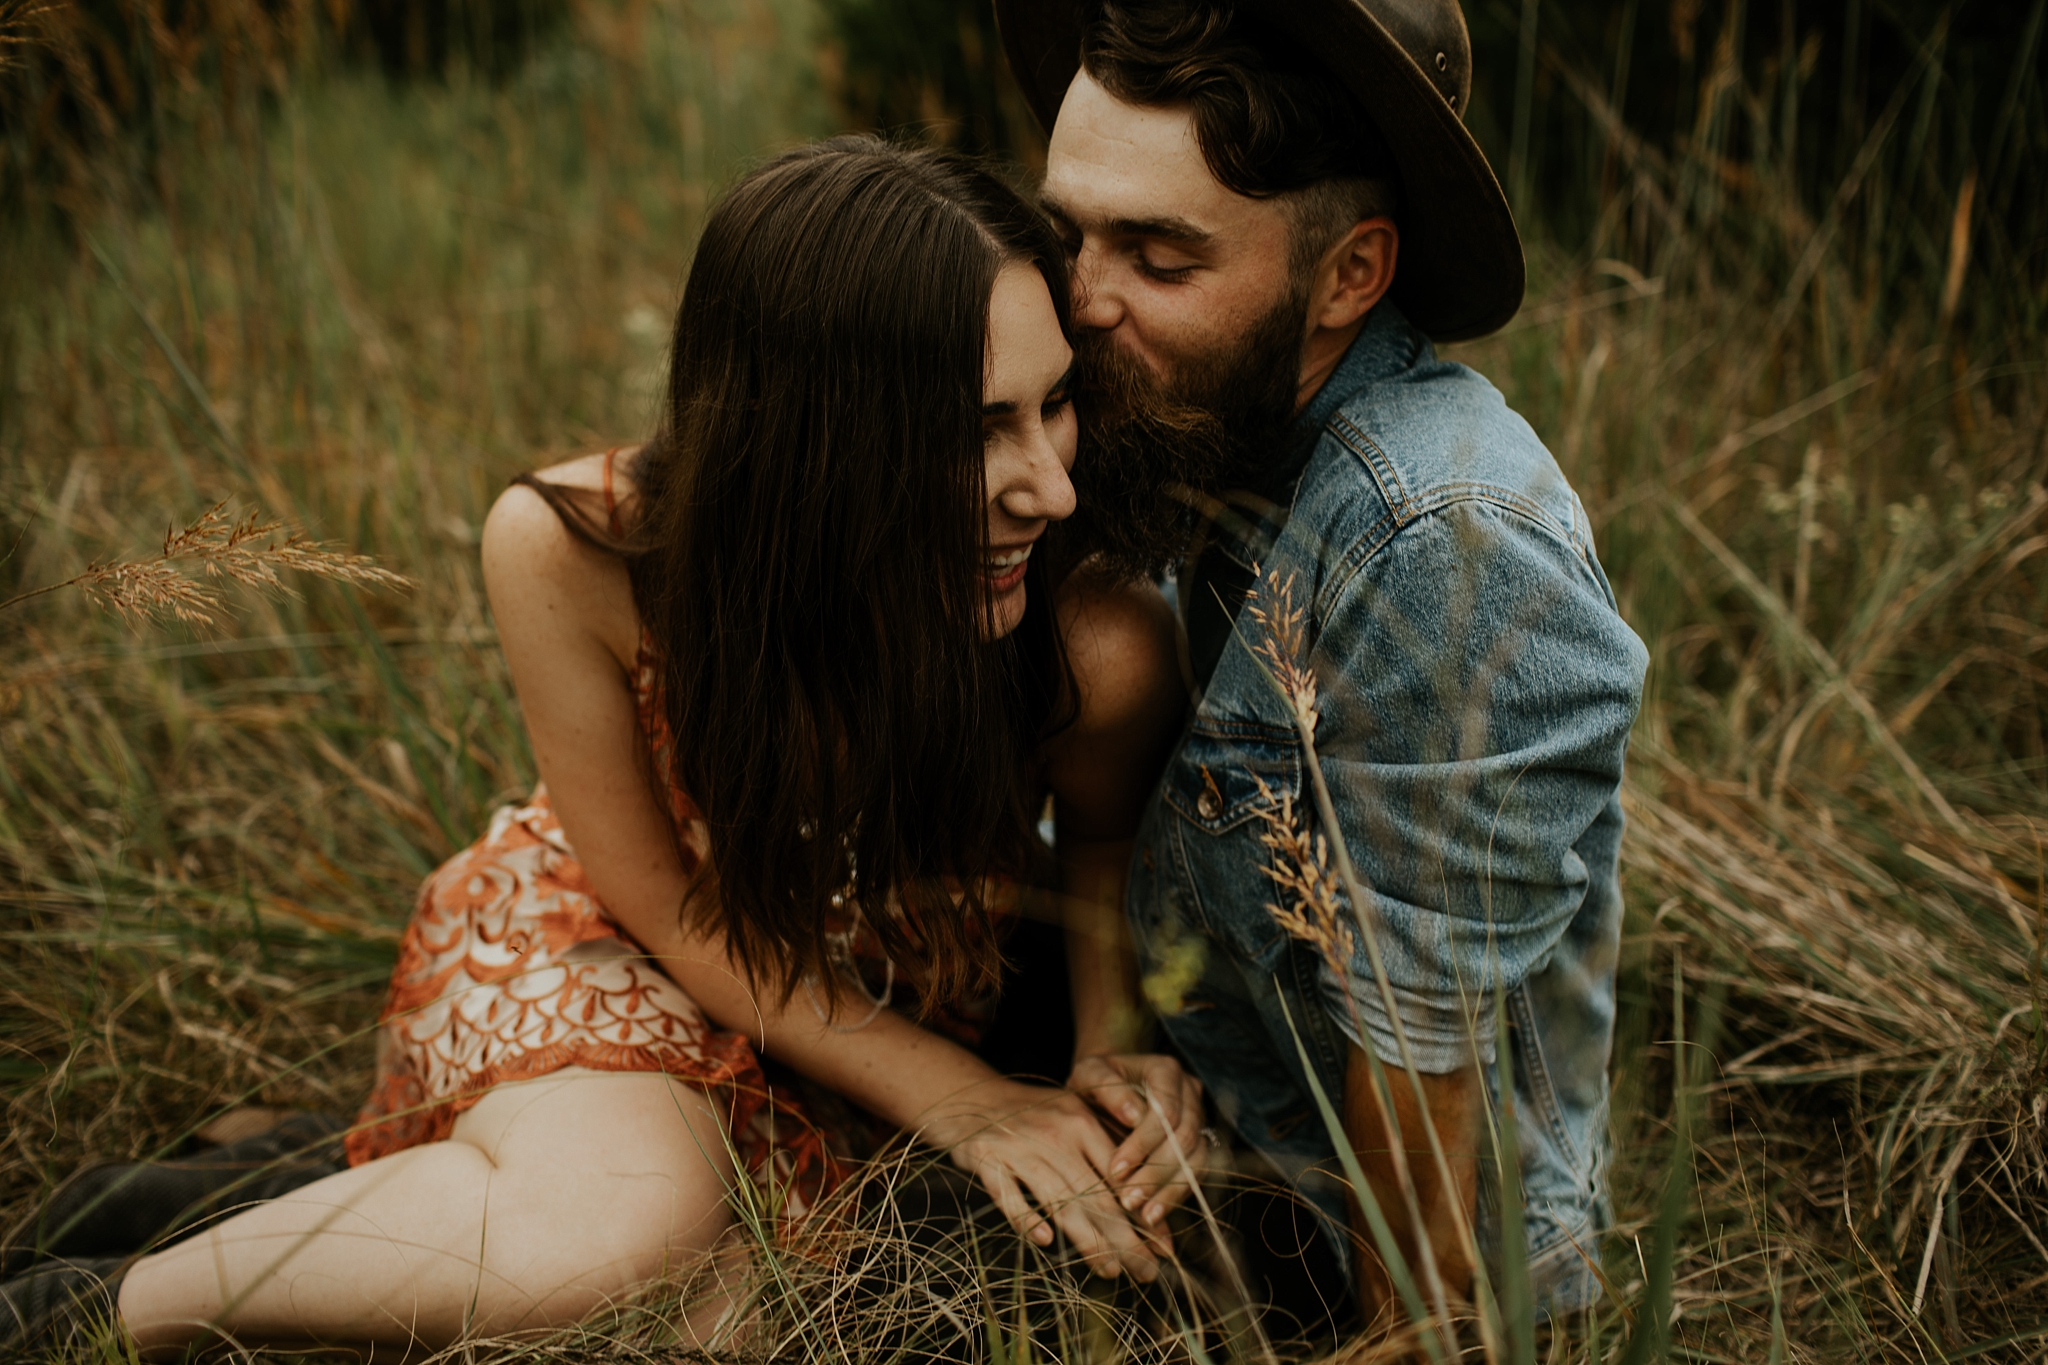 Bohemian Earthy Engagement Session by Trin Jensen Photography  - Nebraska Wedding Photographer_0051.jpg